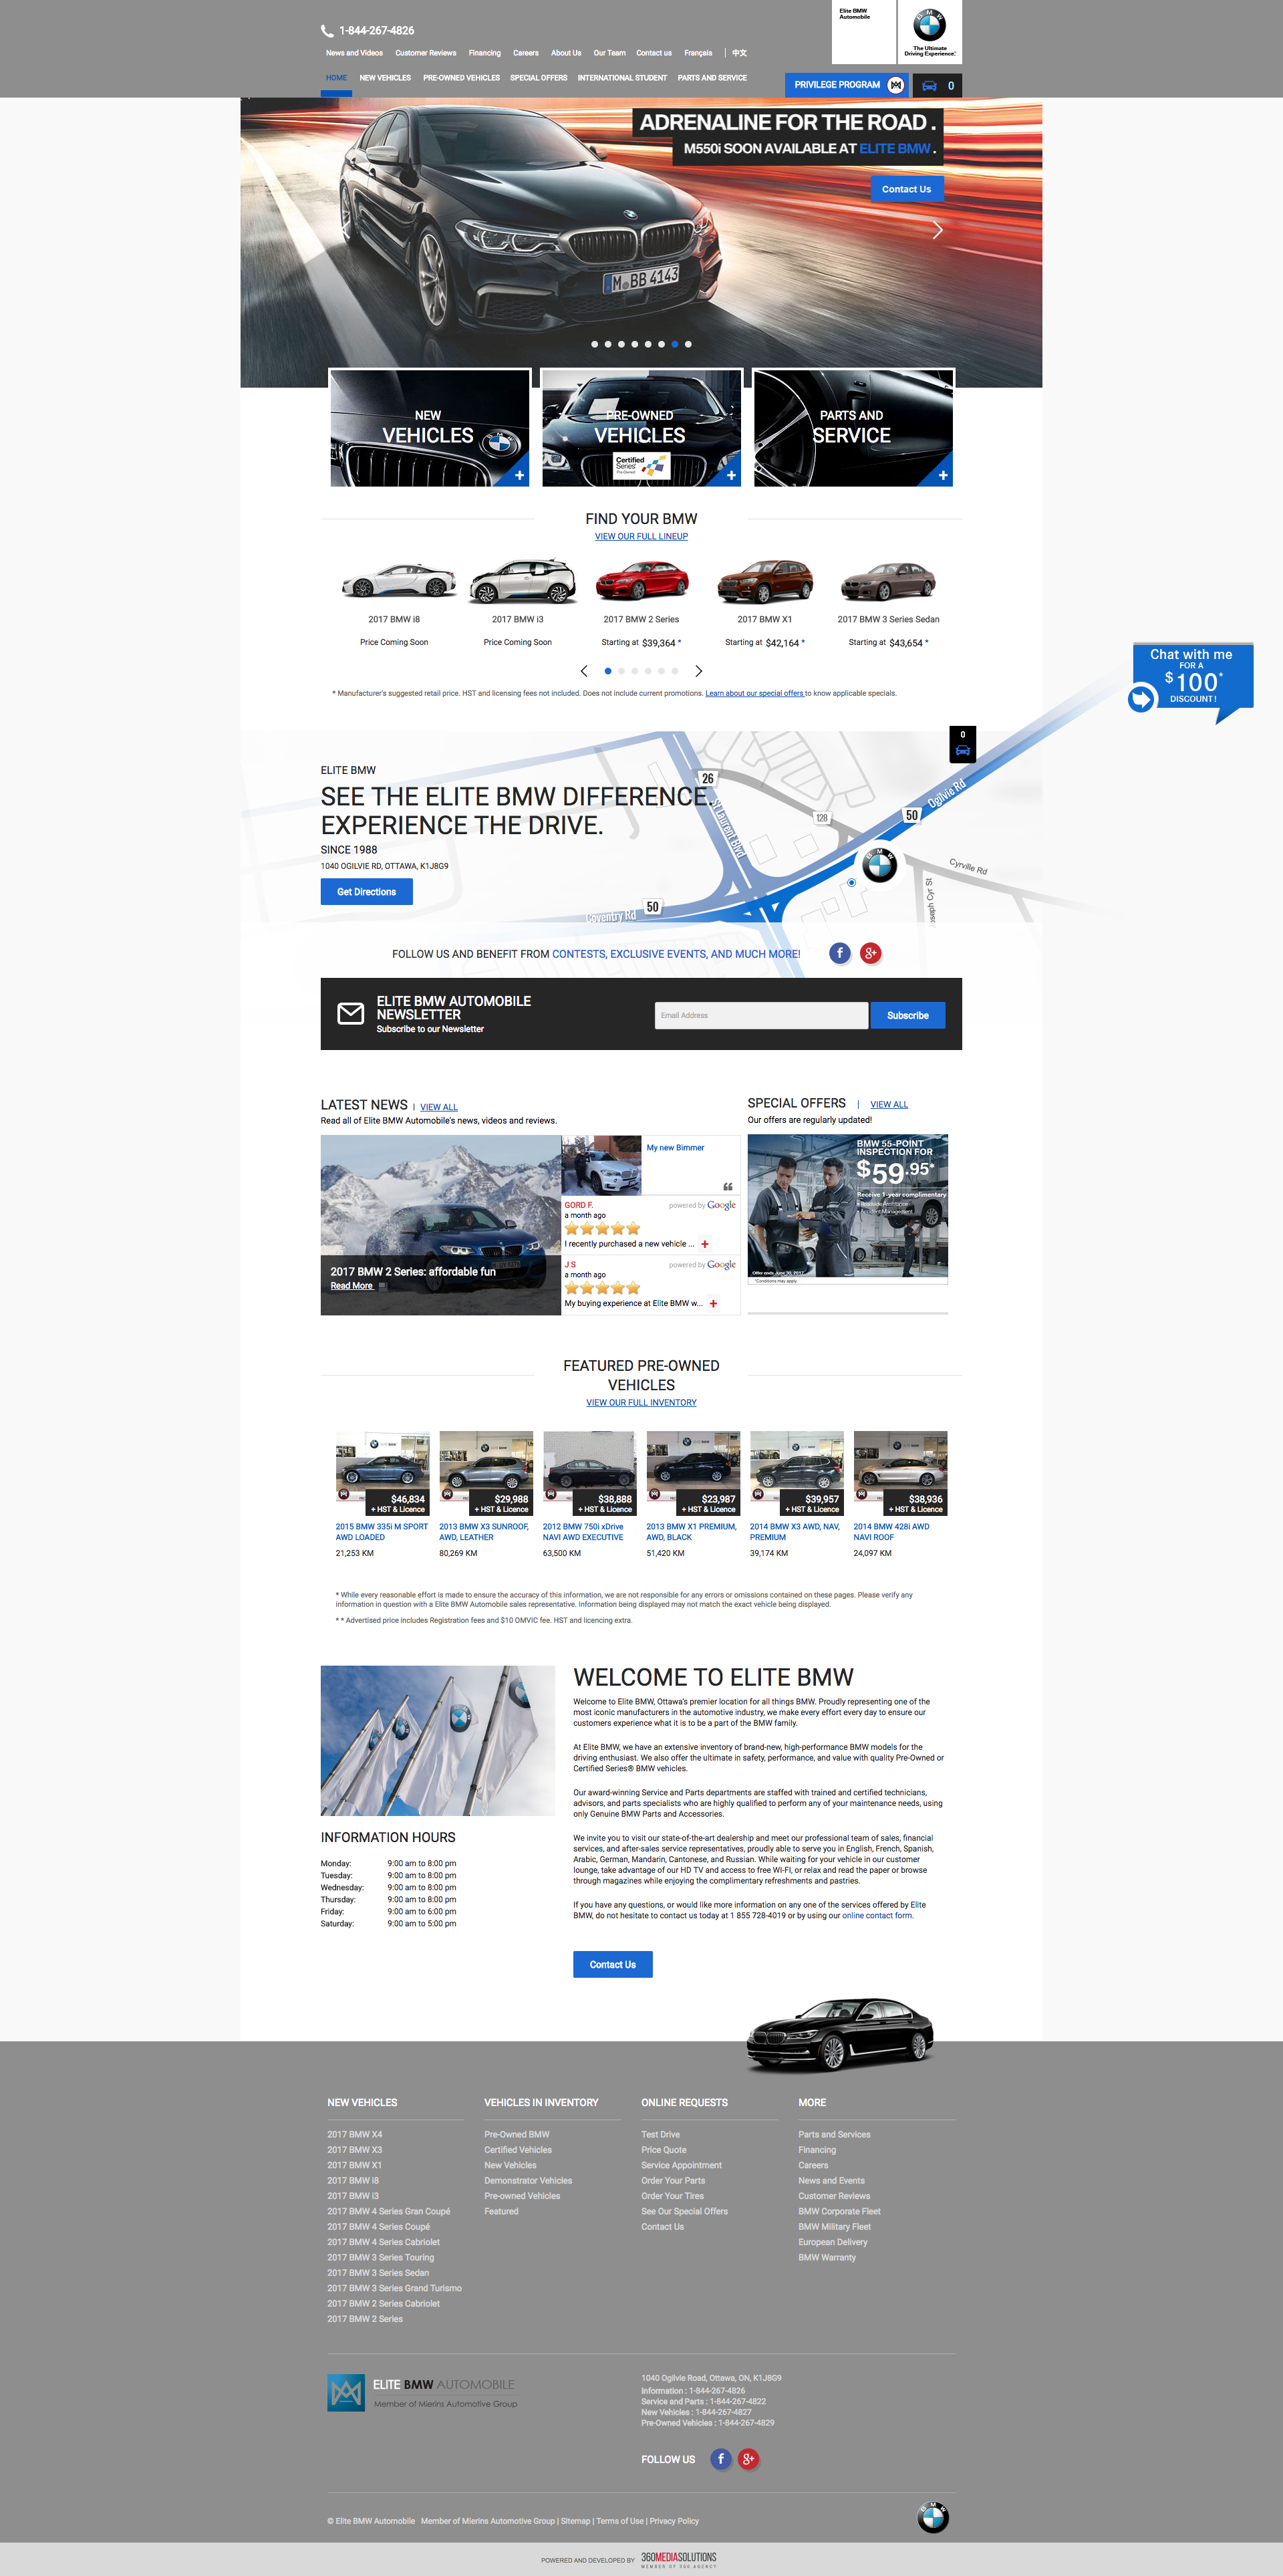 Best Web Design For Car Dealers Get Inspired Today Webdesign Design Graphicdesign Car Websites Agency 360agency New Trucks Best Family Cars Bmw Dealer